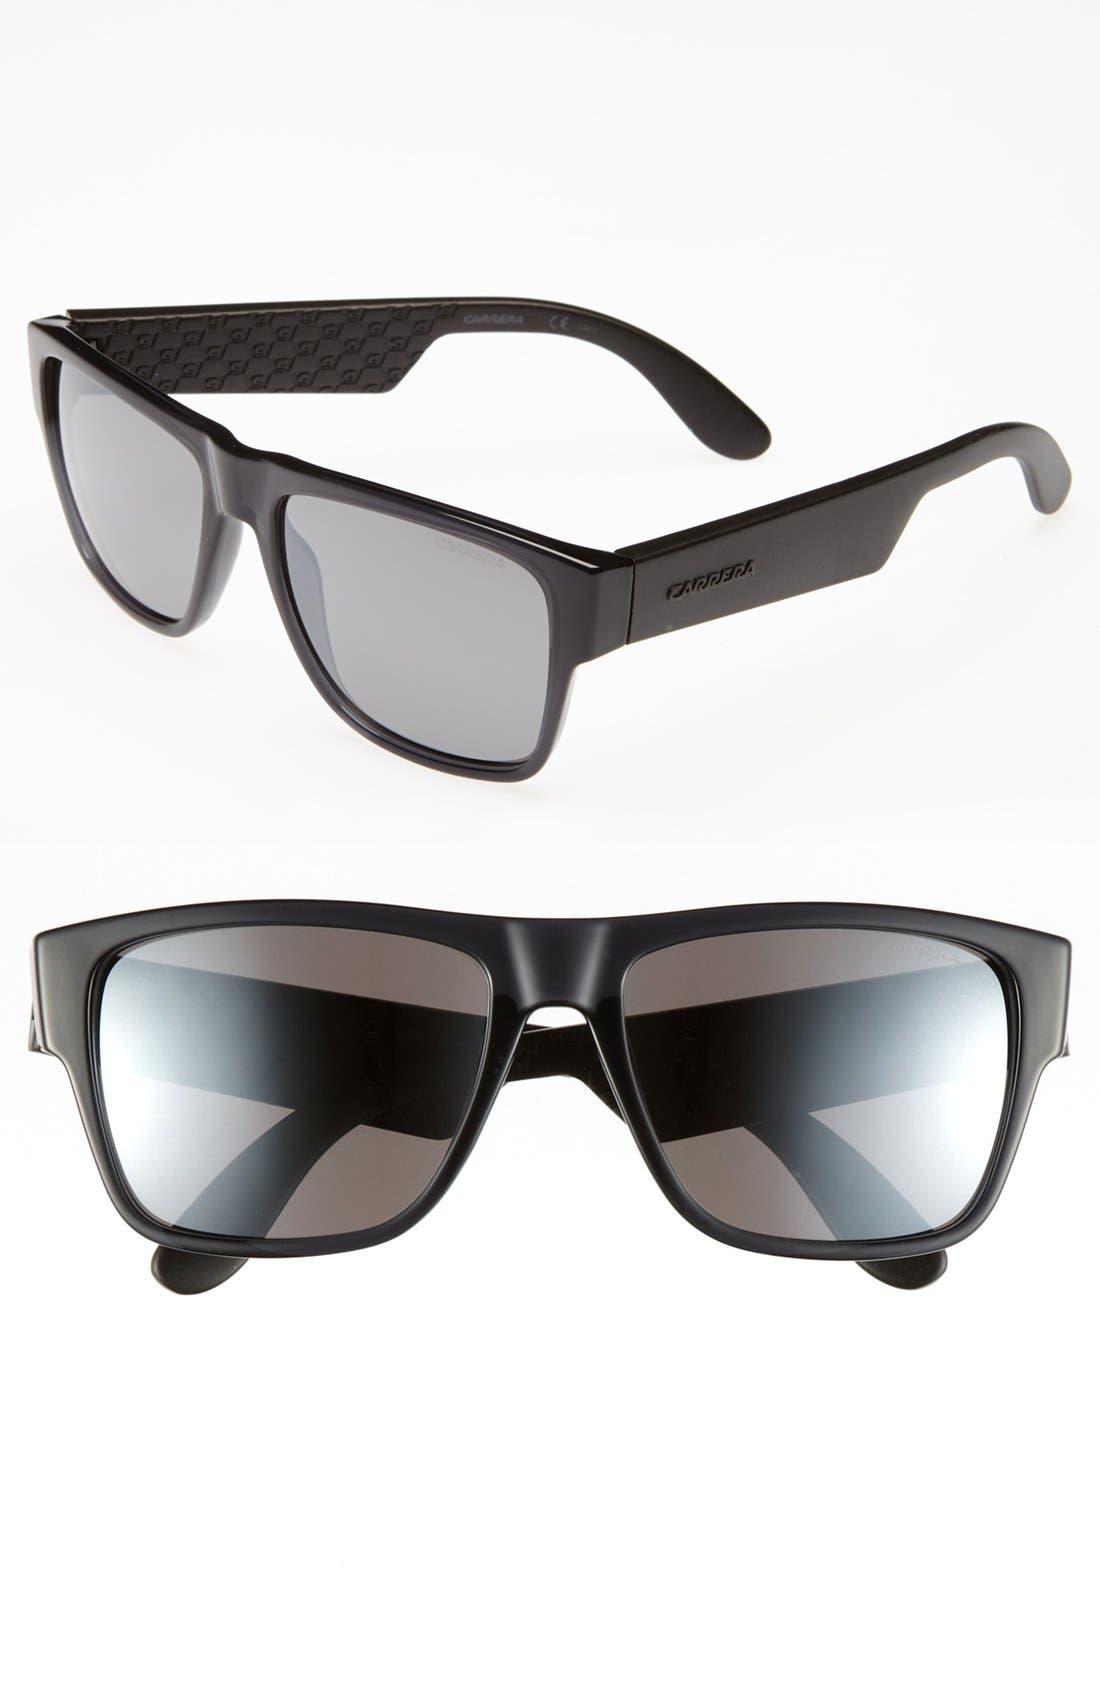 Alternate Image 1 Selected - Carrera Eyewear 55mm Sunglasses